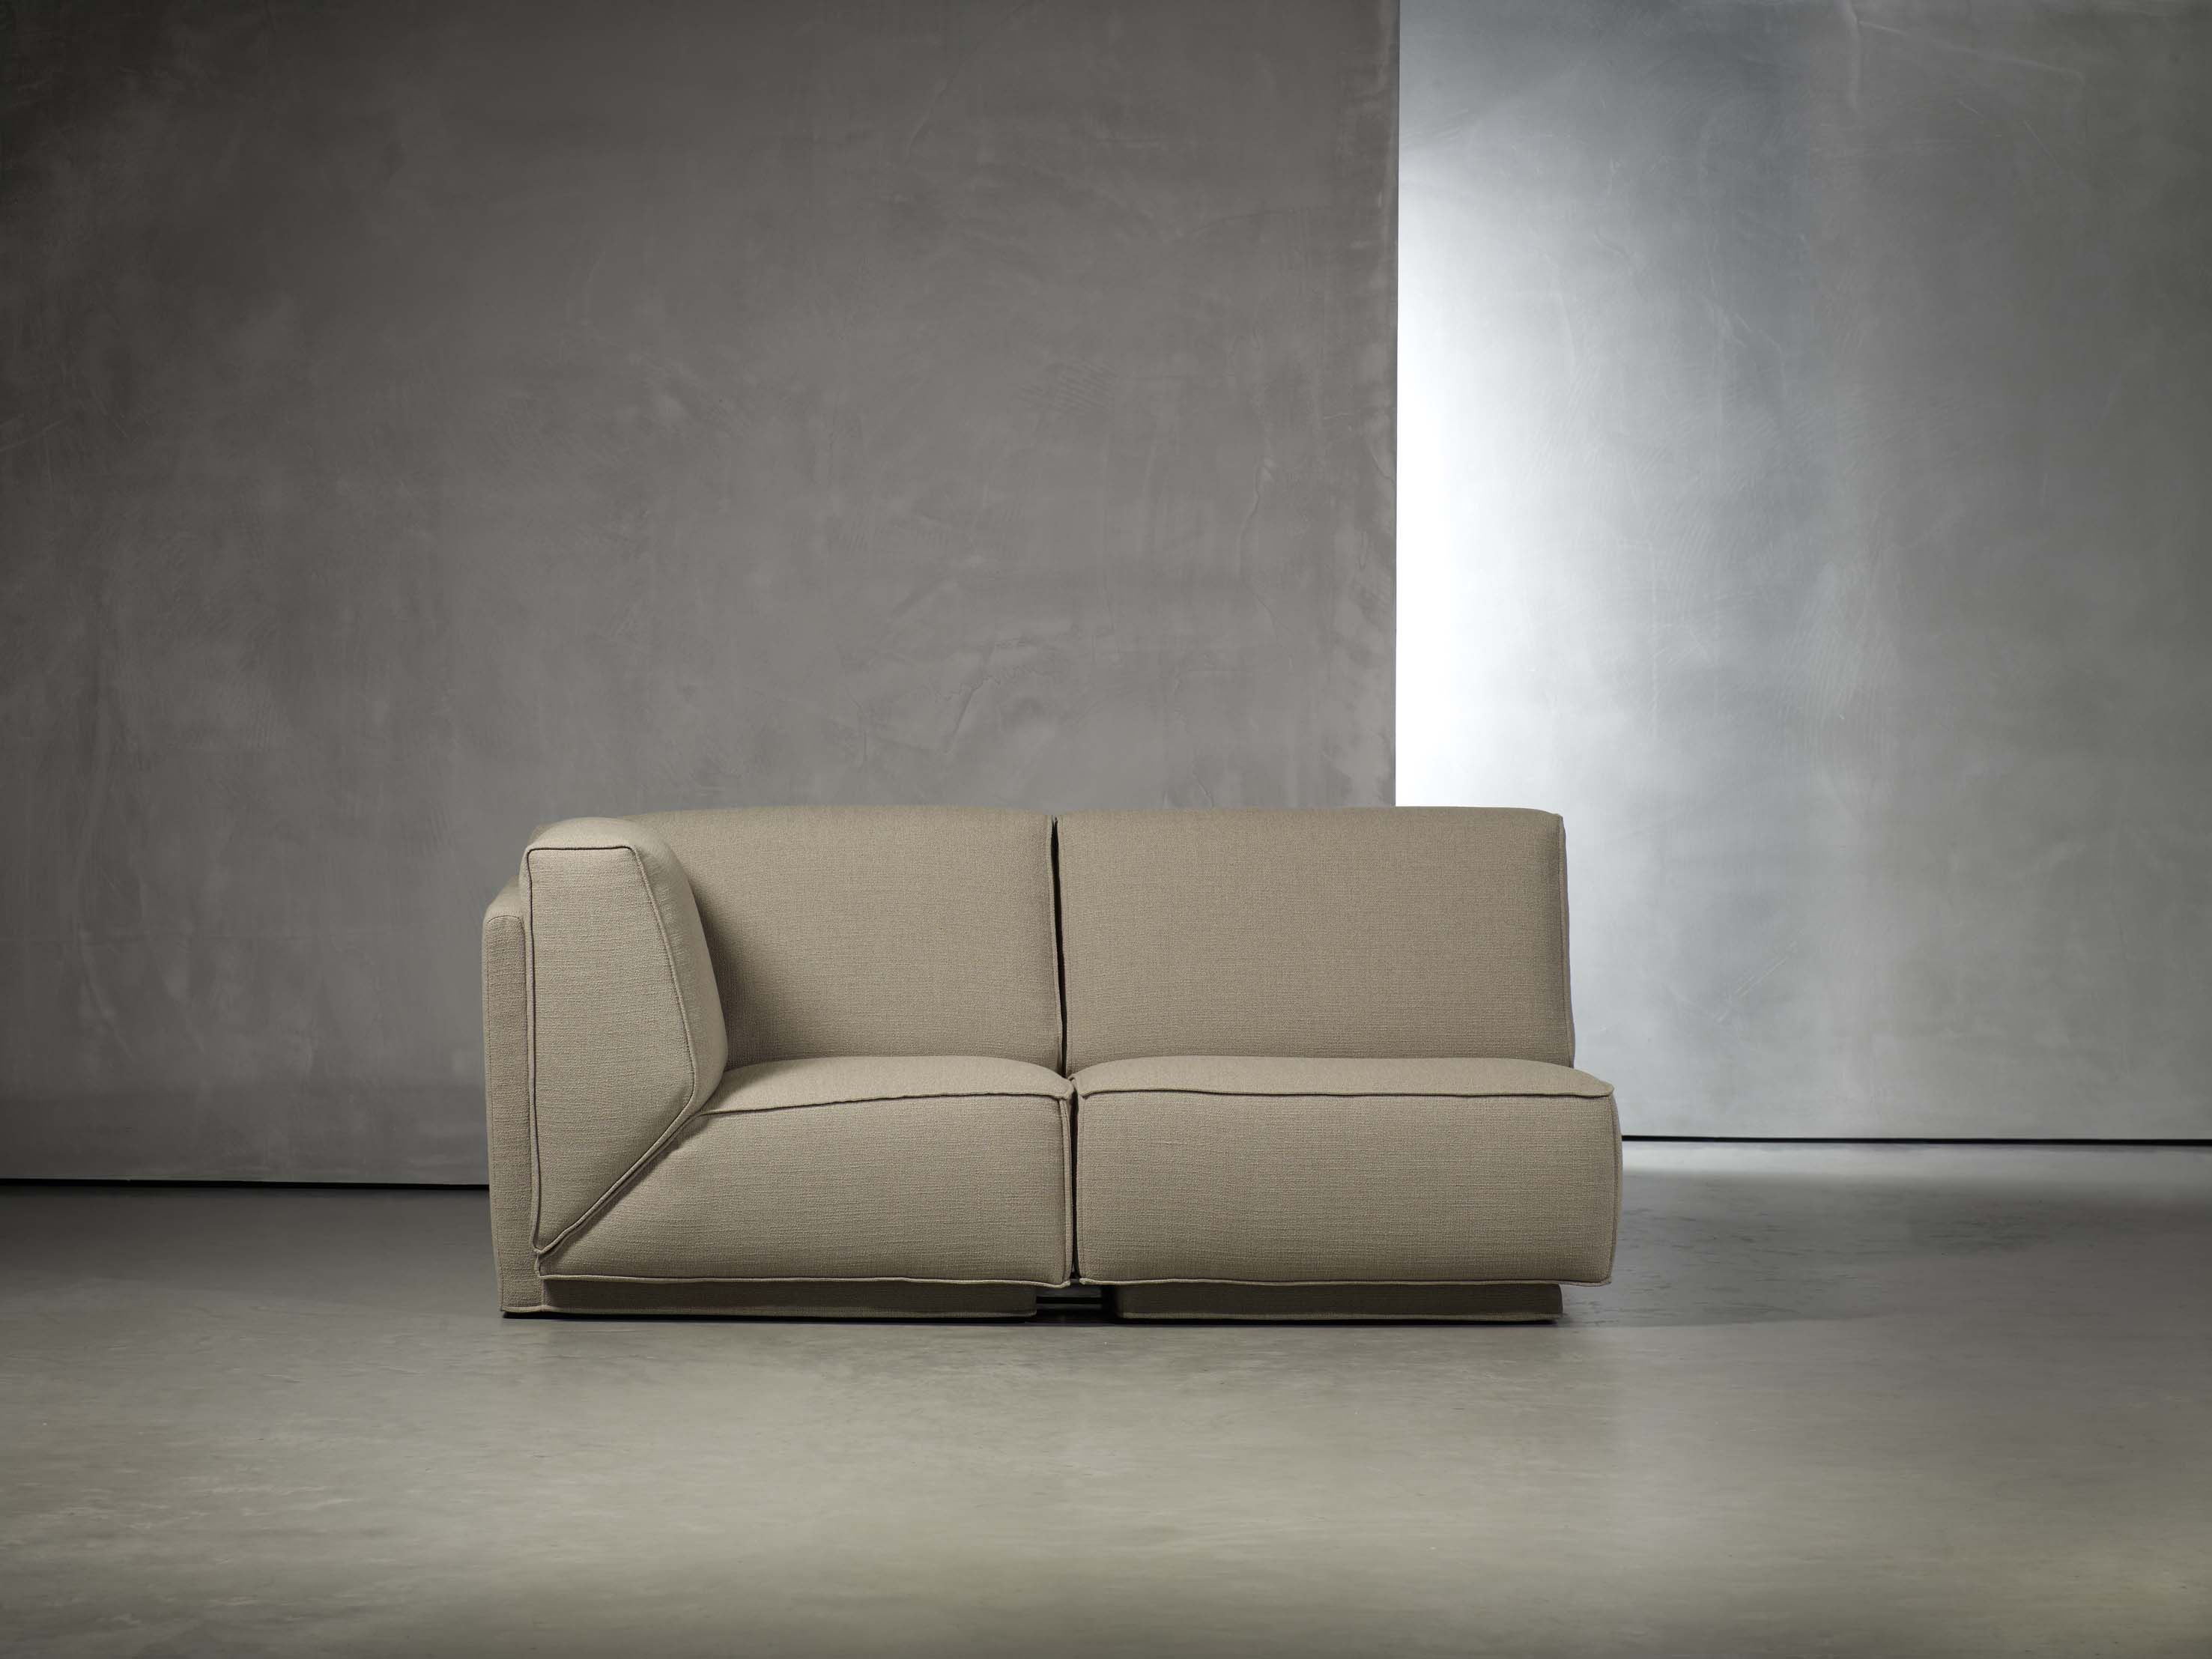 Piet Boon Styling By Karin Meyn | Piet Boon Collection Furniture   DOUTZEN  Sofa